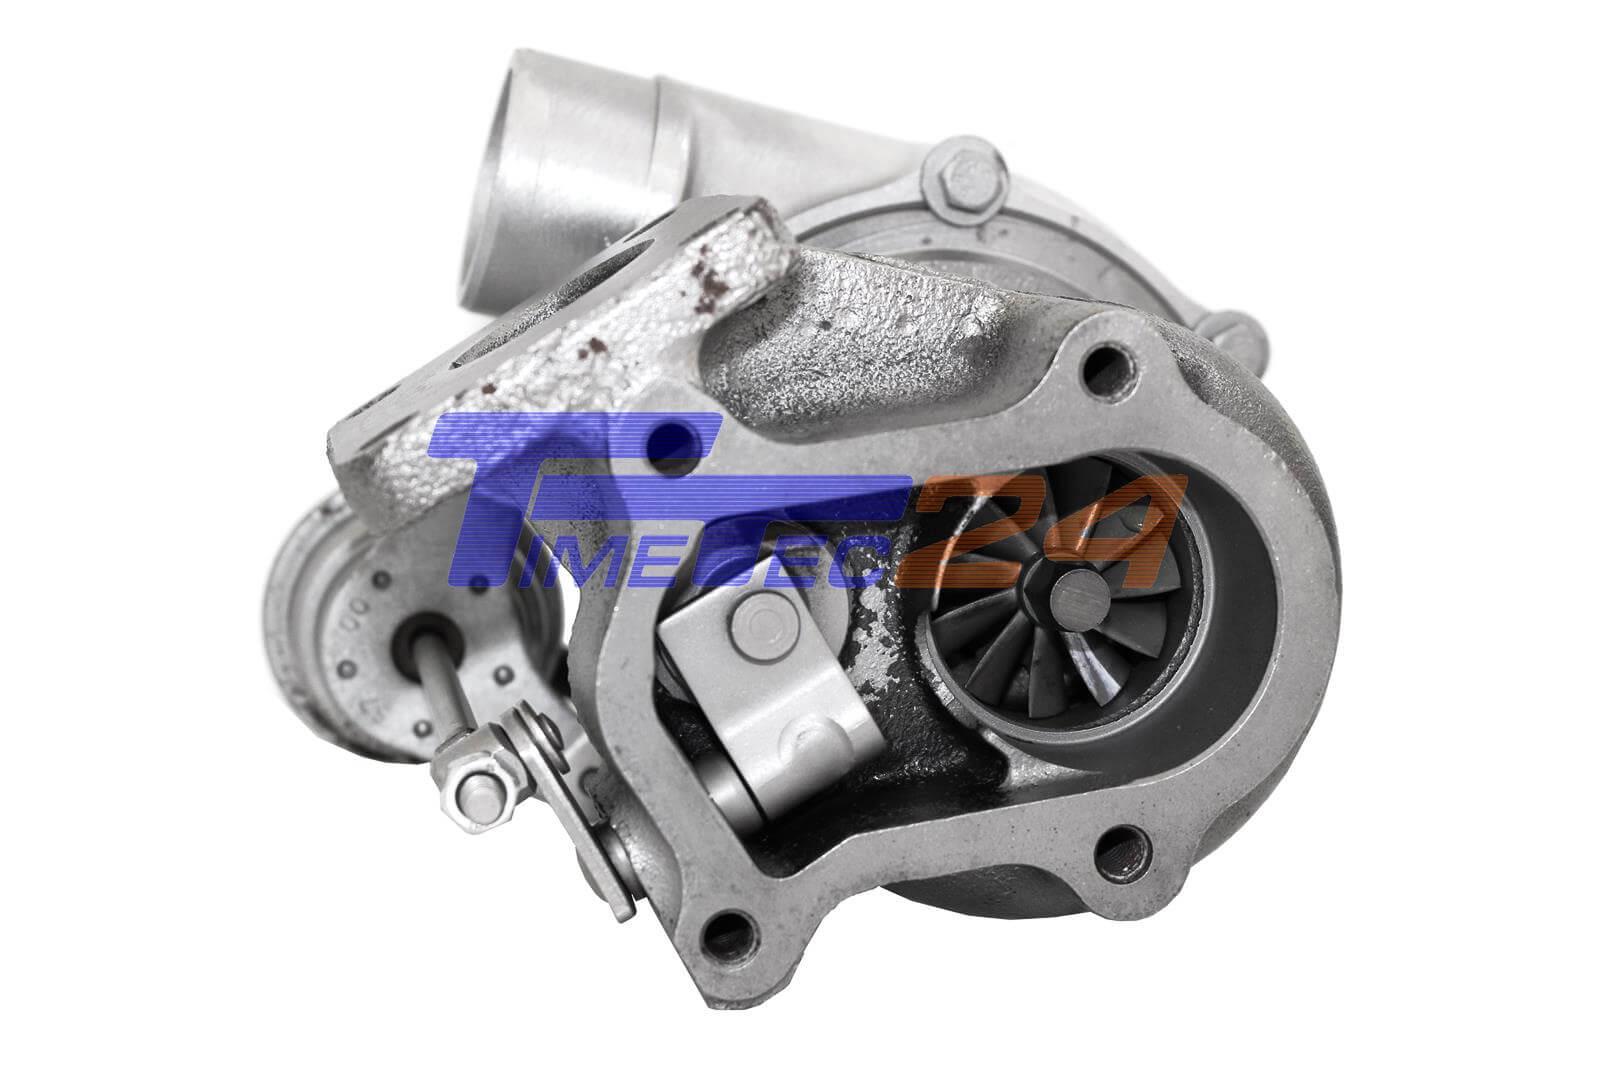 Turbolader & Kompressoren Auto & Motorrad: Teile Turbolader Turbo ...